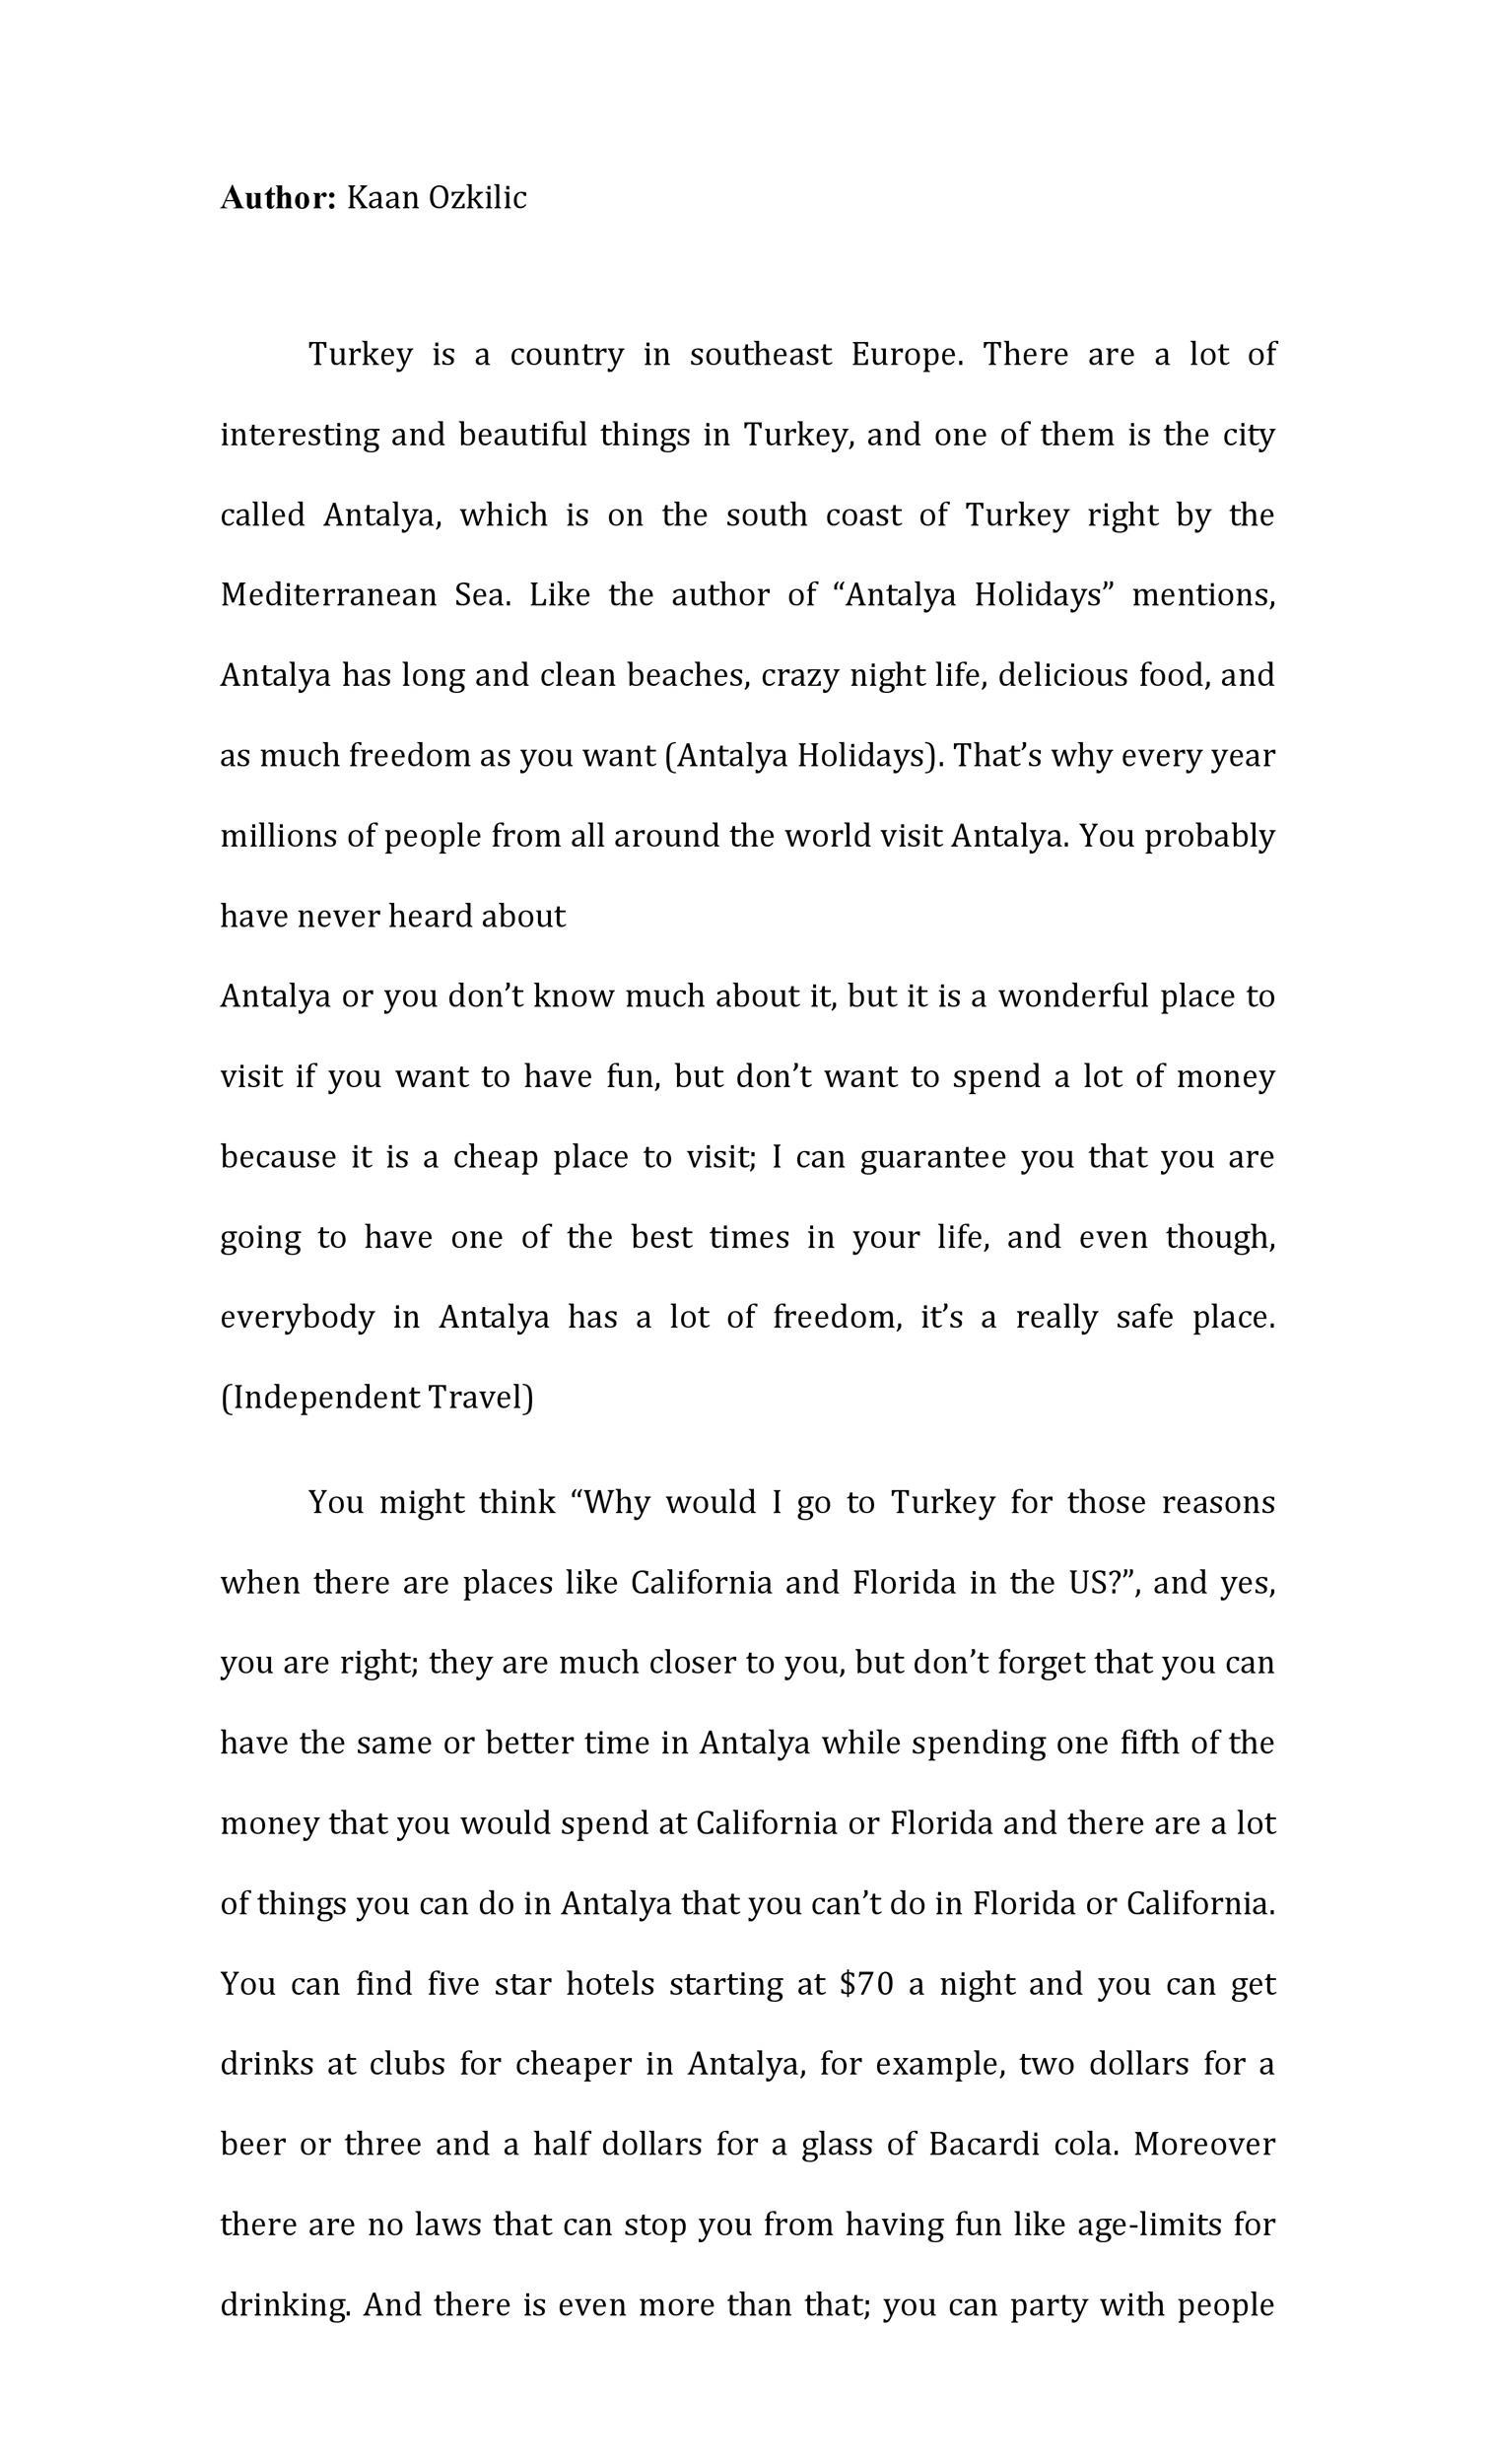 Example Of A Persuasive Essay